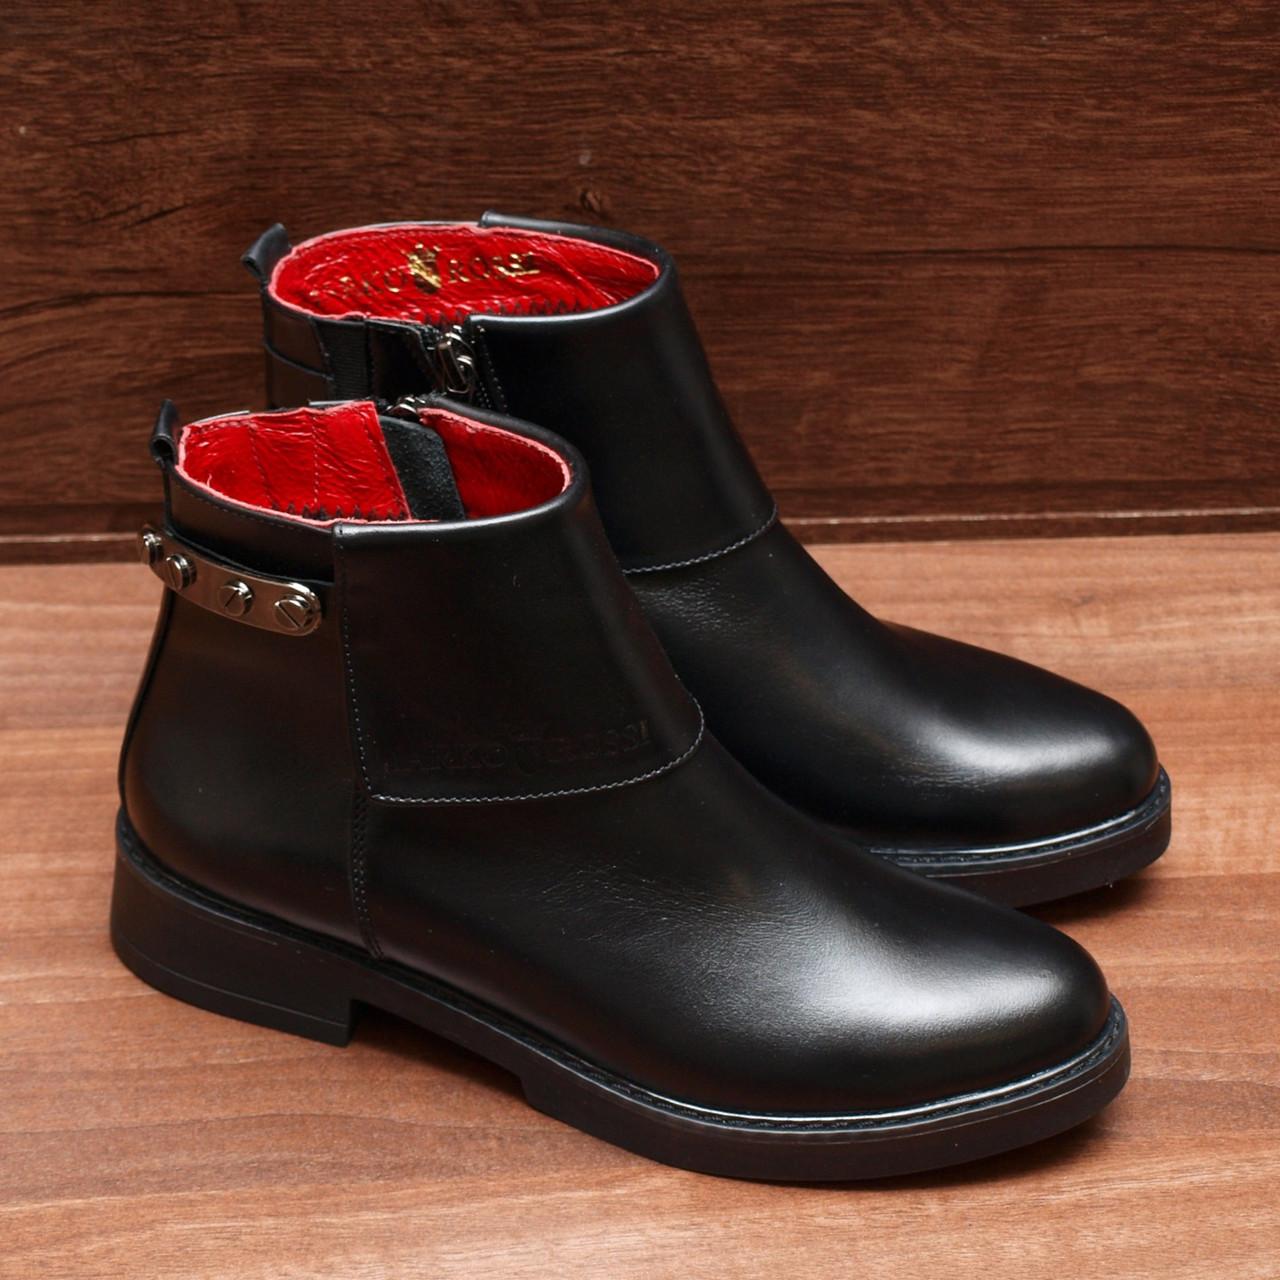 Женские ботинки 18540.01 «Marko Rossi» 38